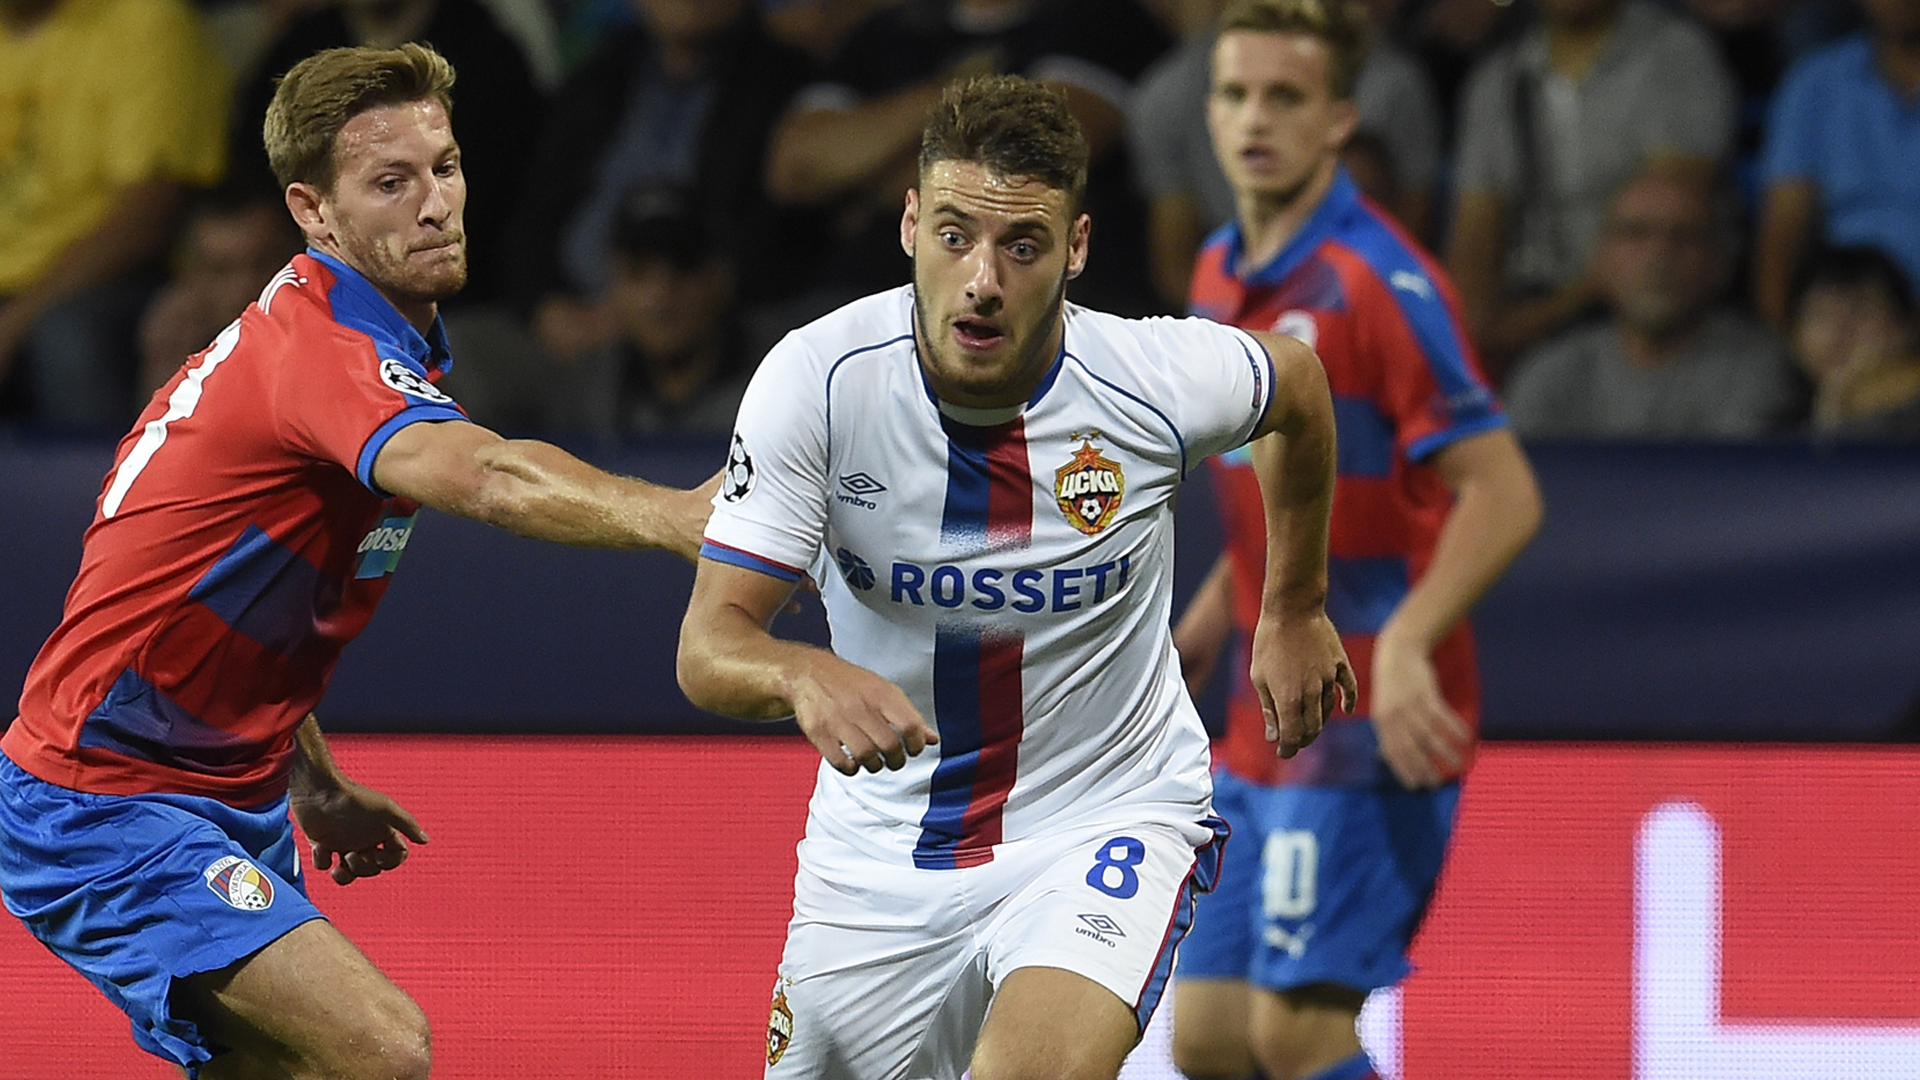 CSKA Moscow Champions League 2018-19